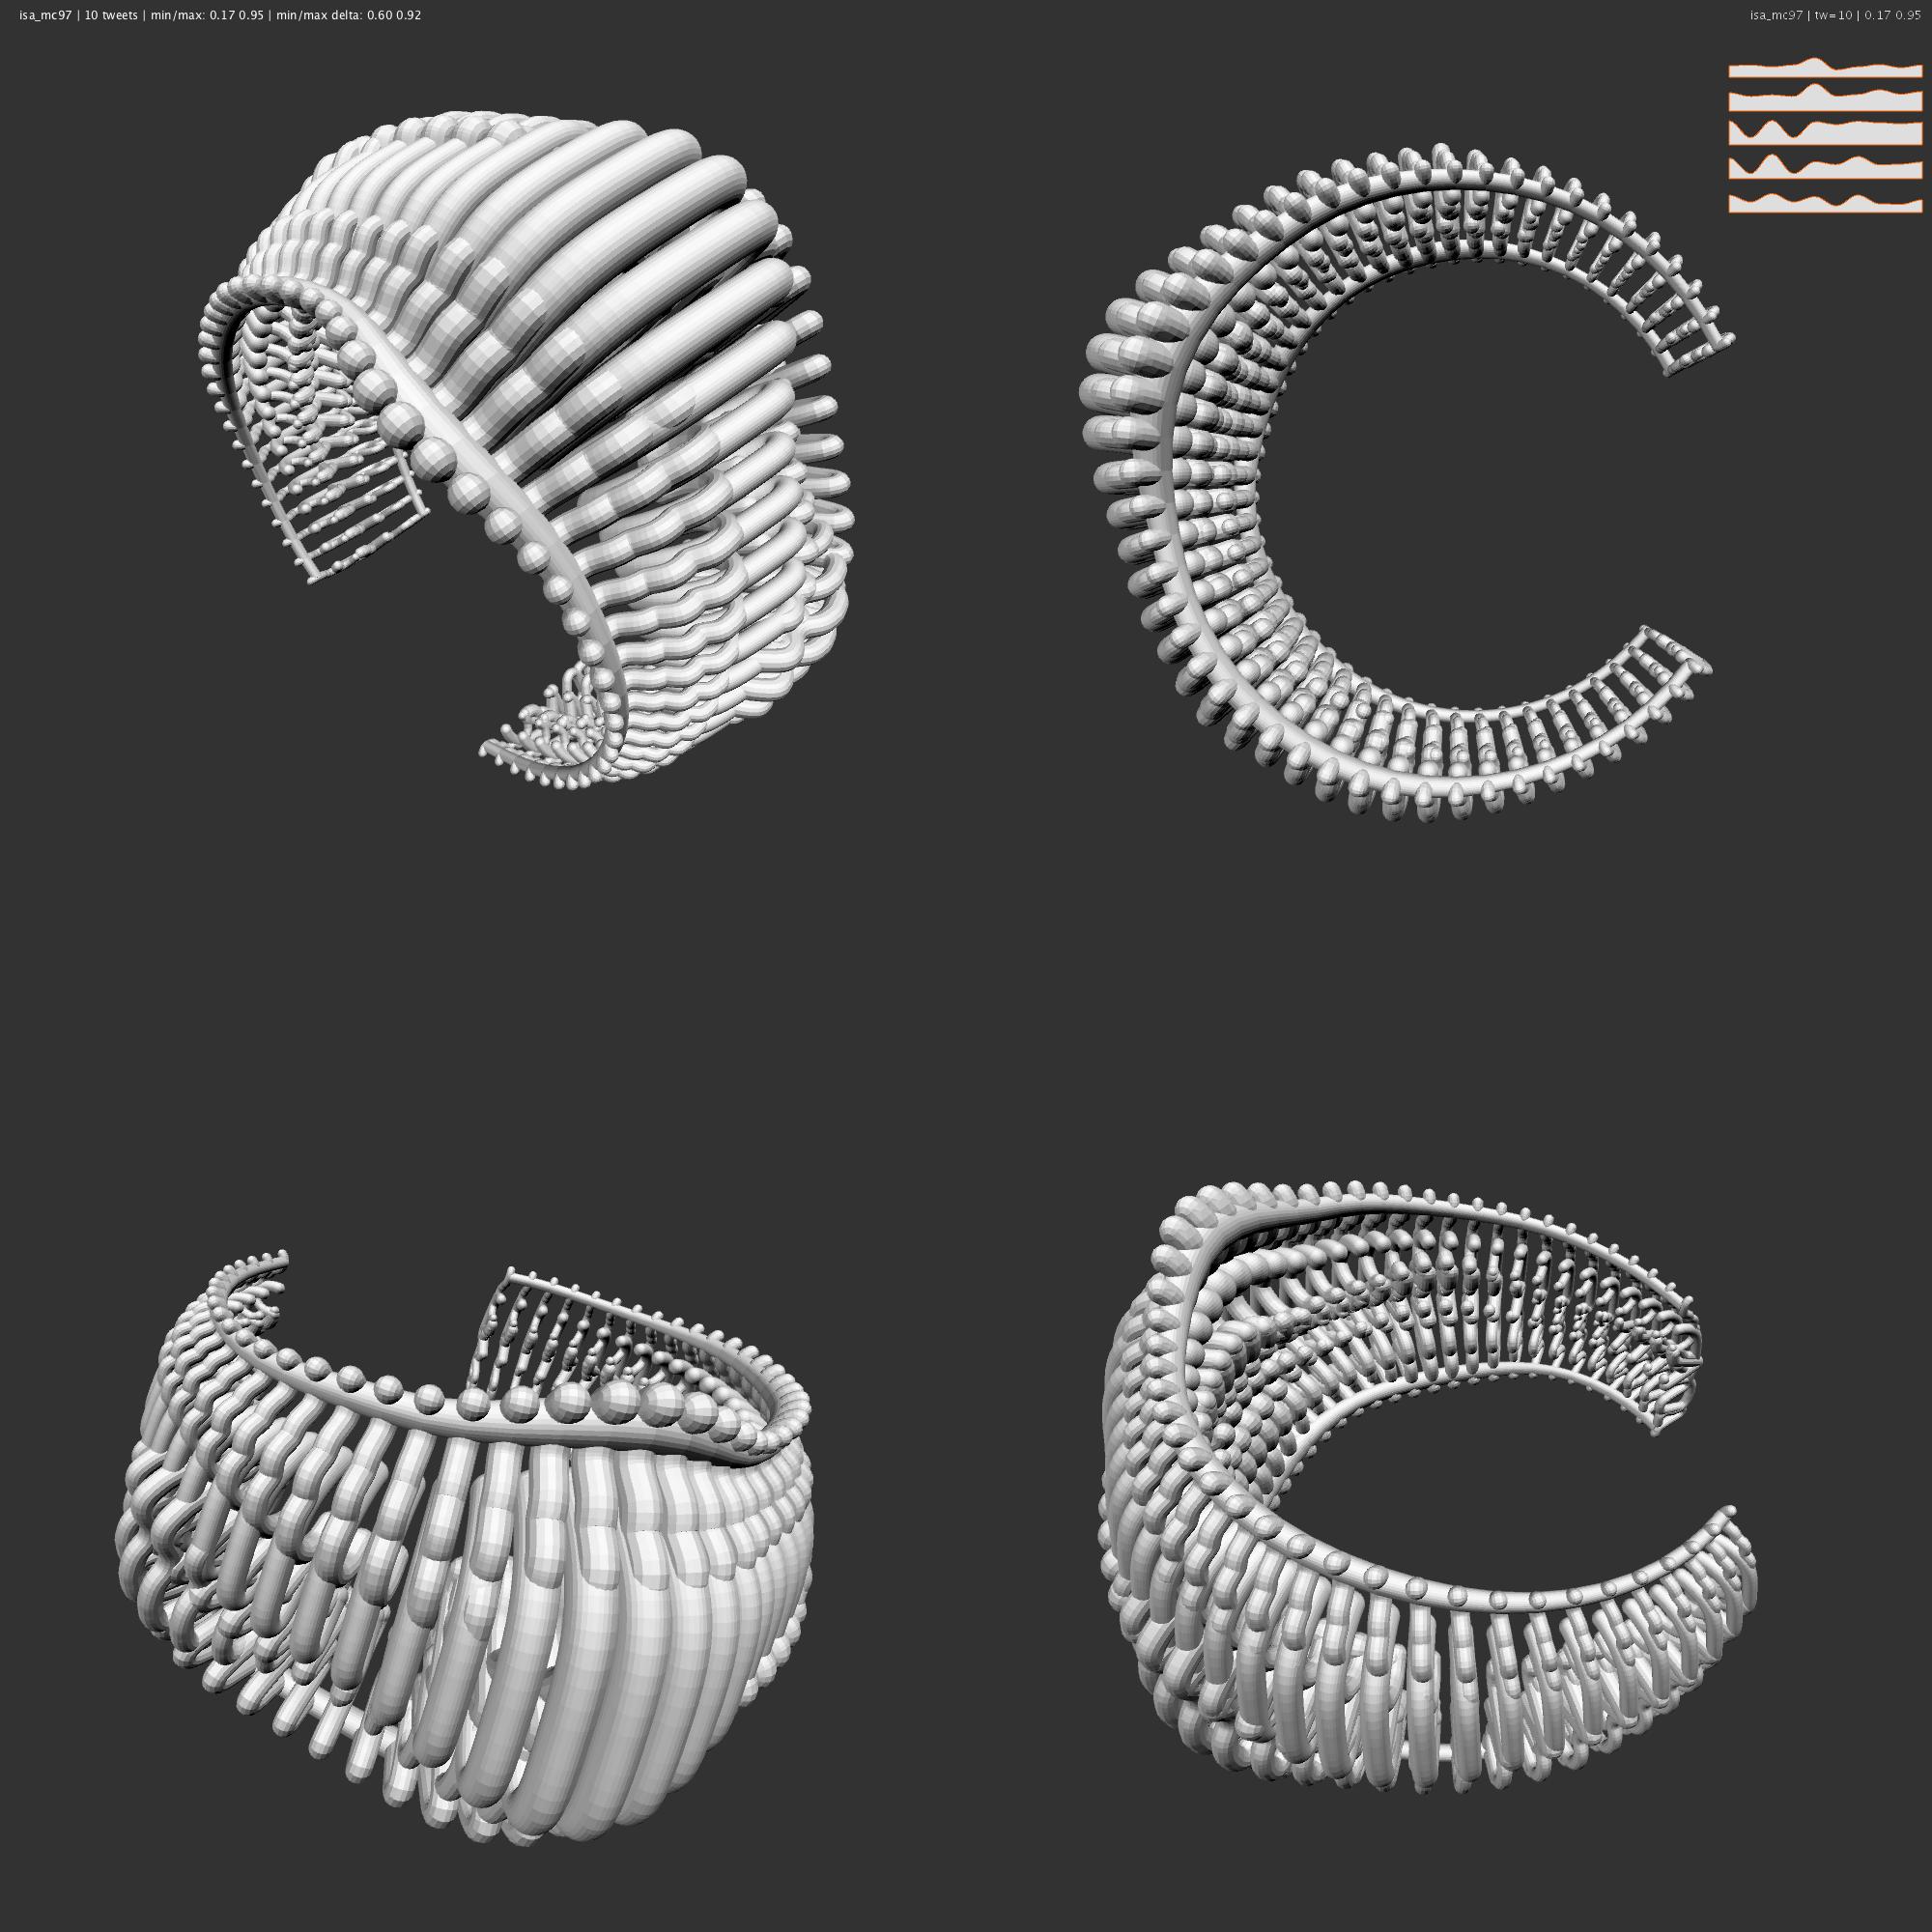 Bracelet Design for Ruffmercy (by Gannon/Watz)